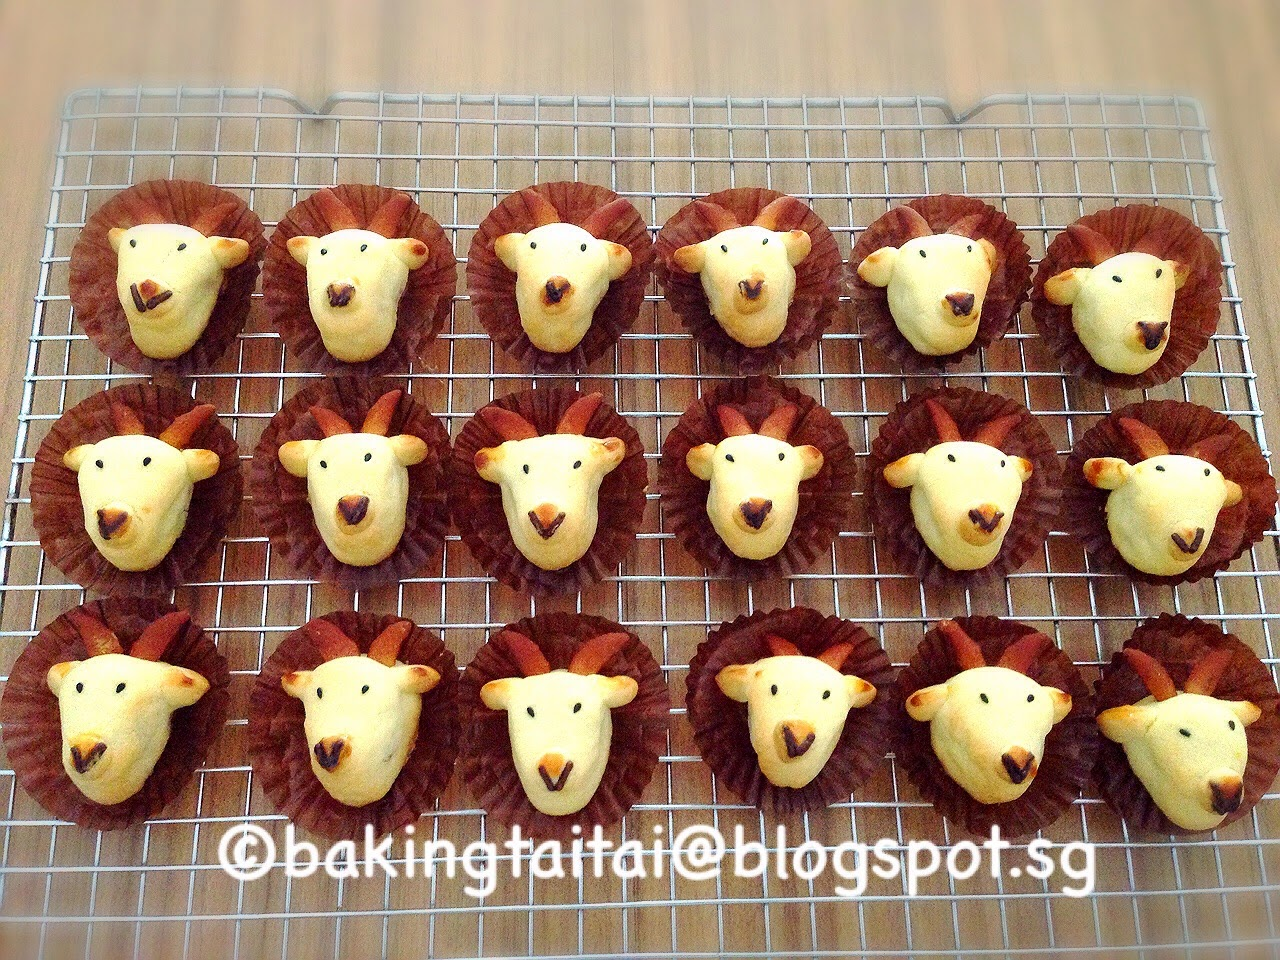 http://bakingtaitai.blogspot.sg/2015/02/cheesy-pineapple-tarts-goat-shaped.html